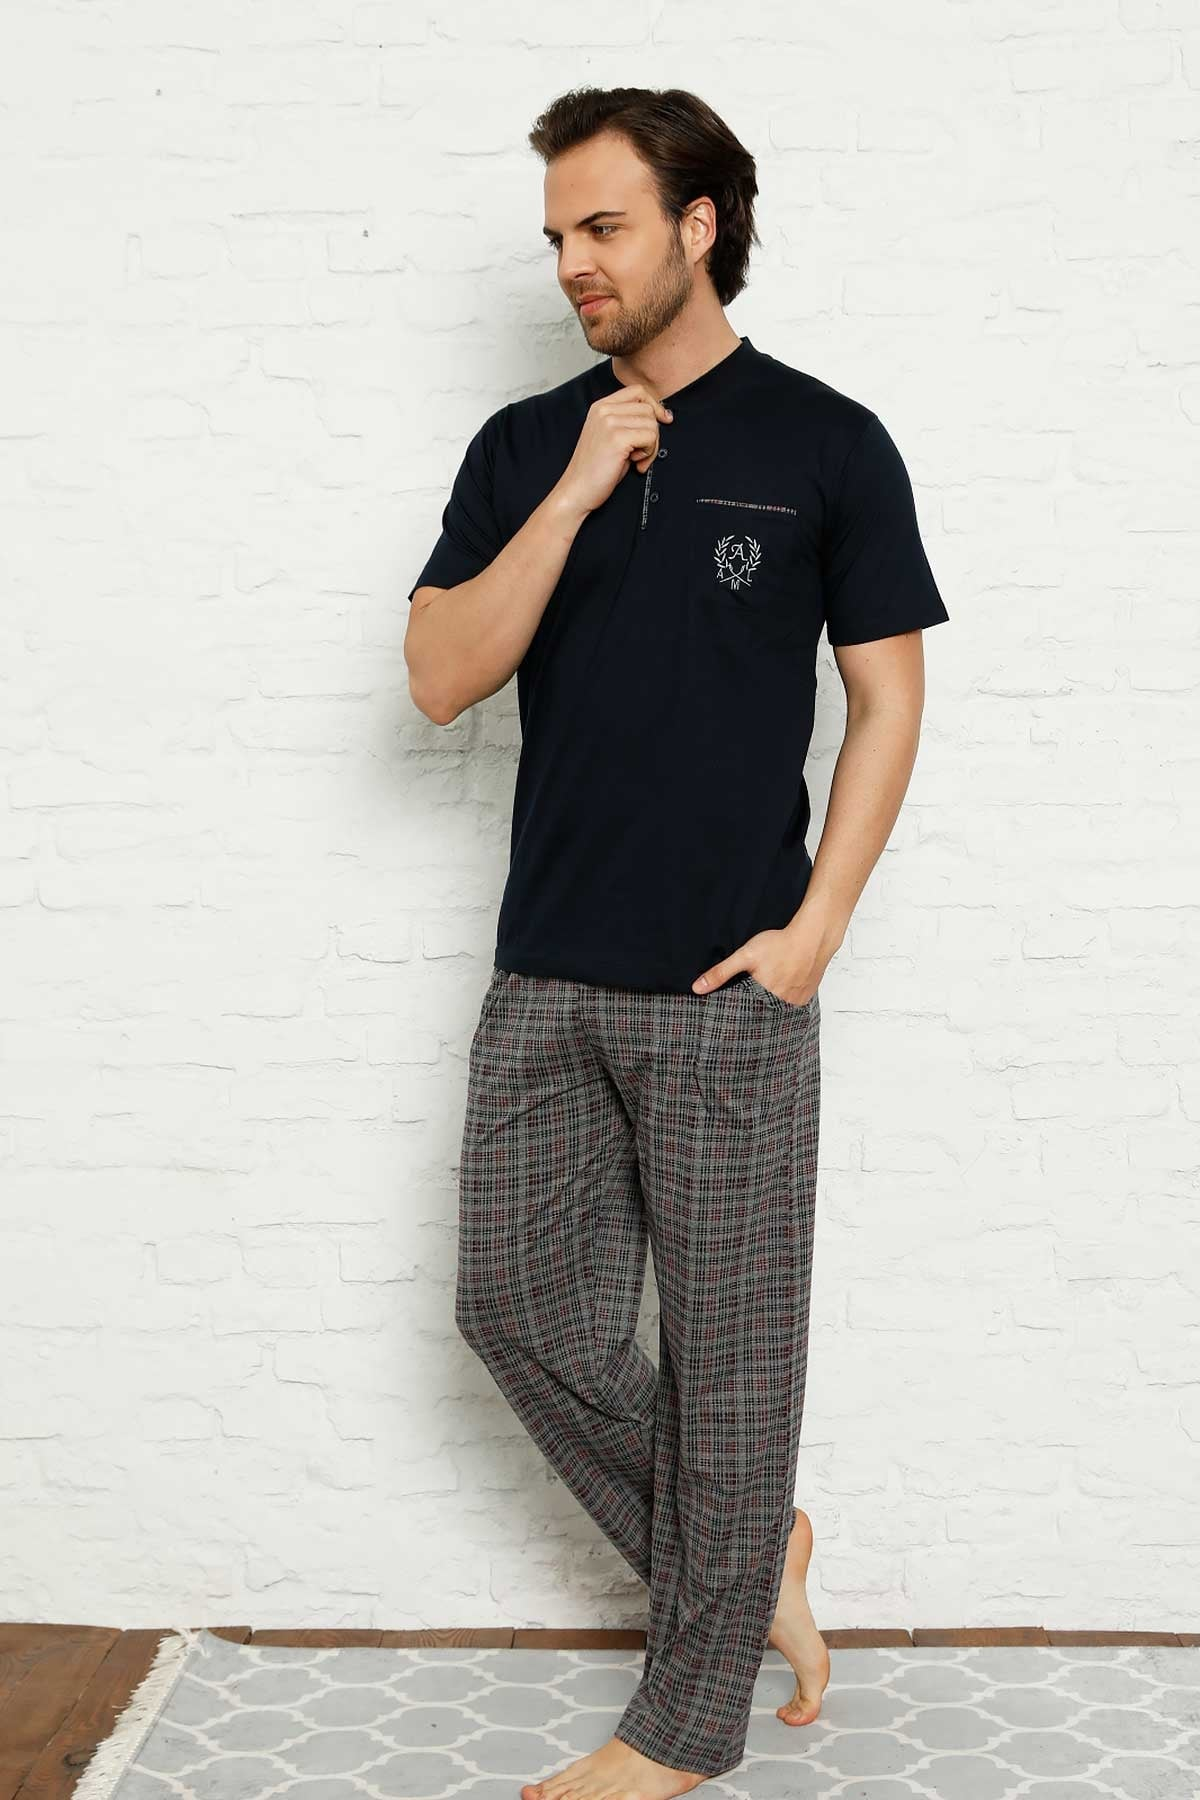 New Summer Spring Men 'S Pajamas Sets Short Sleeve Pockets 2 Color Sleepwear Pajamas Suit Homewear Overnight Dressing Gown